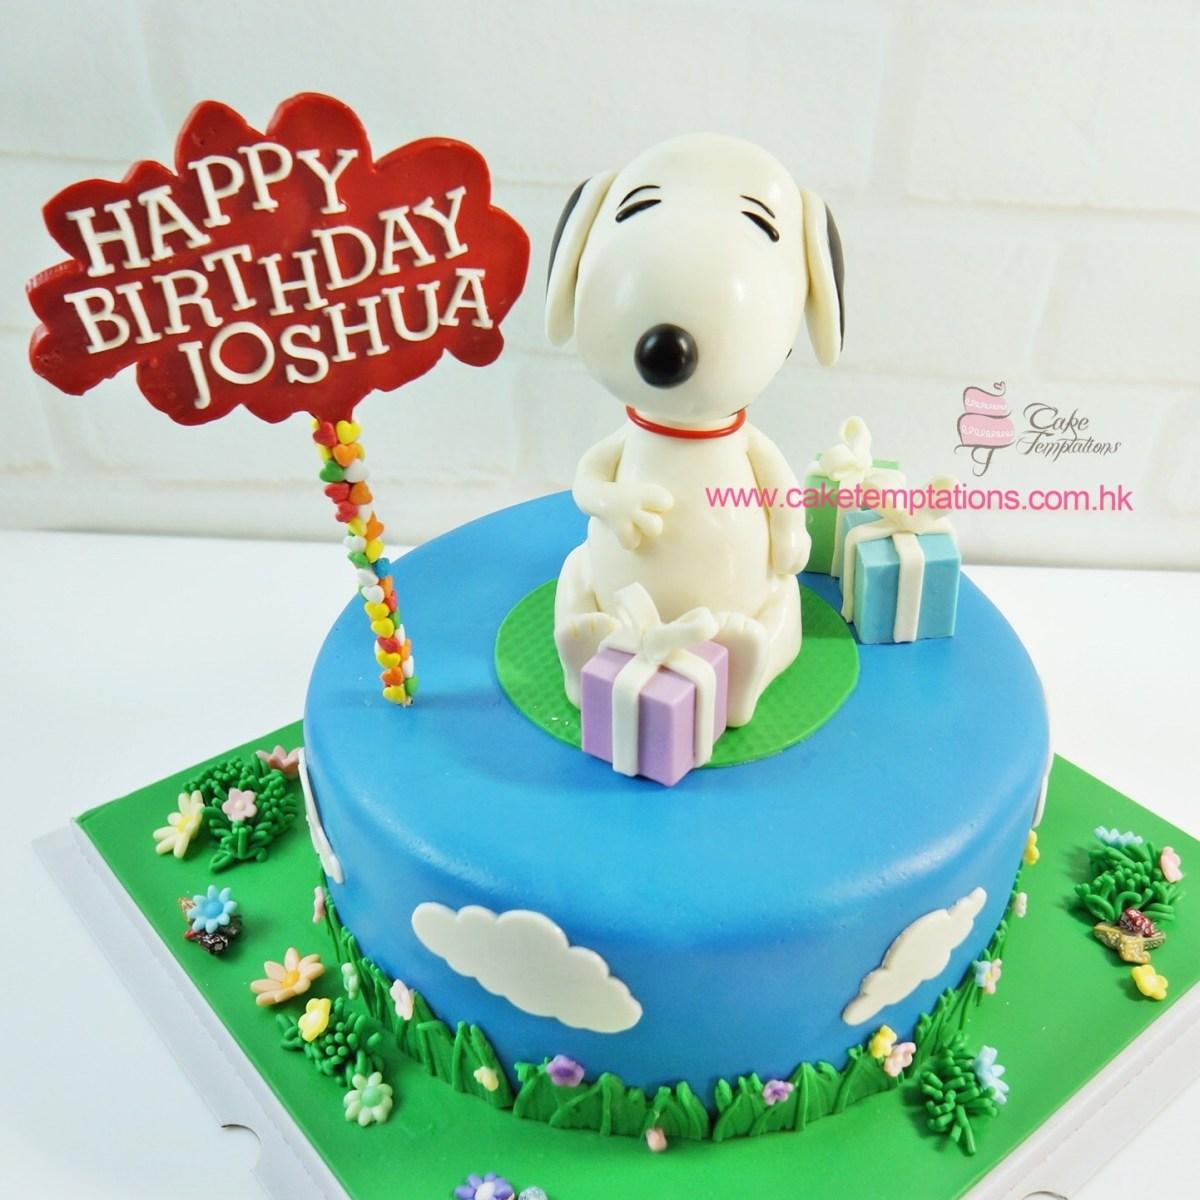 Pleasant Snoopy Birthday Cake Snoopy Birthday With Gift Box Cake Western Birthday Cards Printable Trancafe Filternl